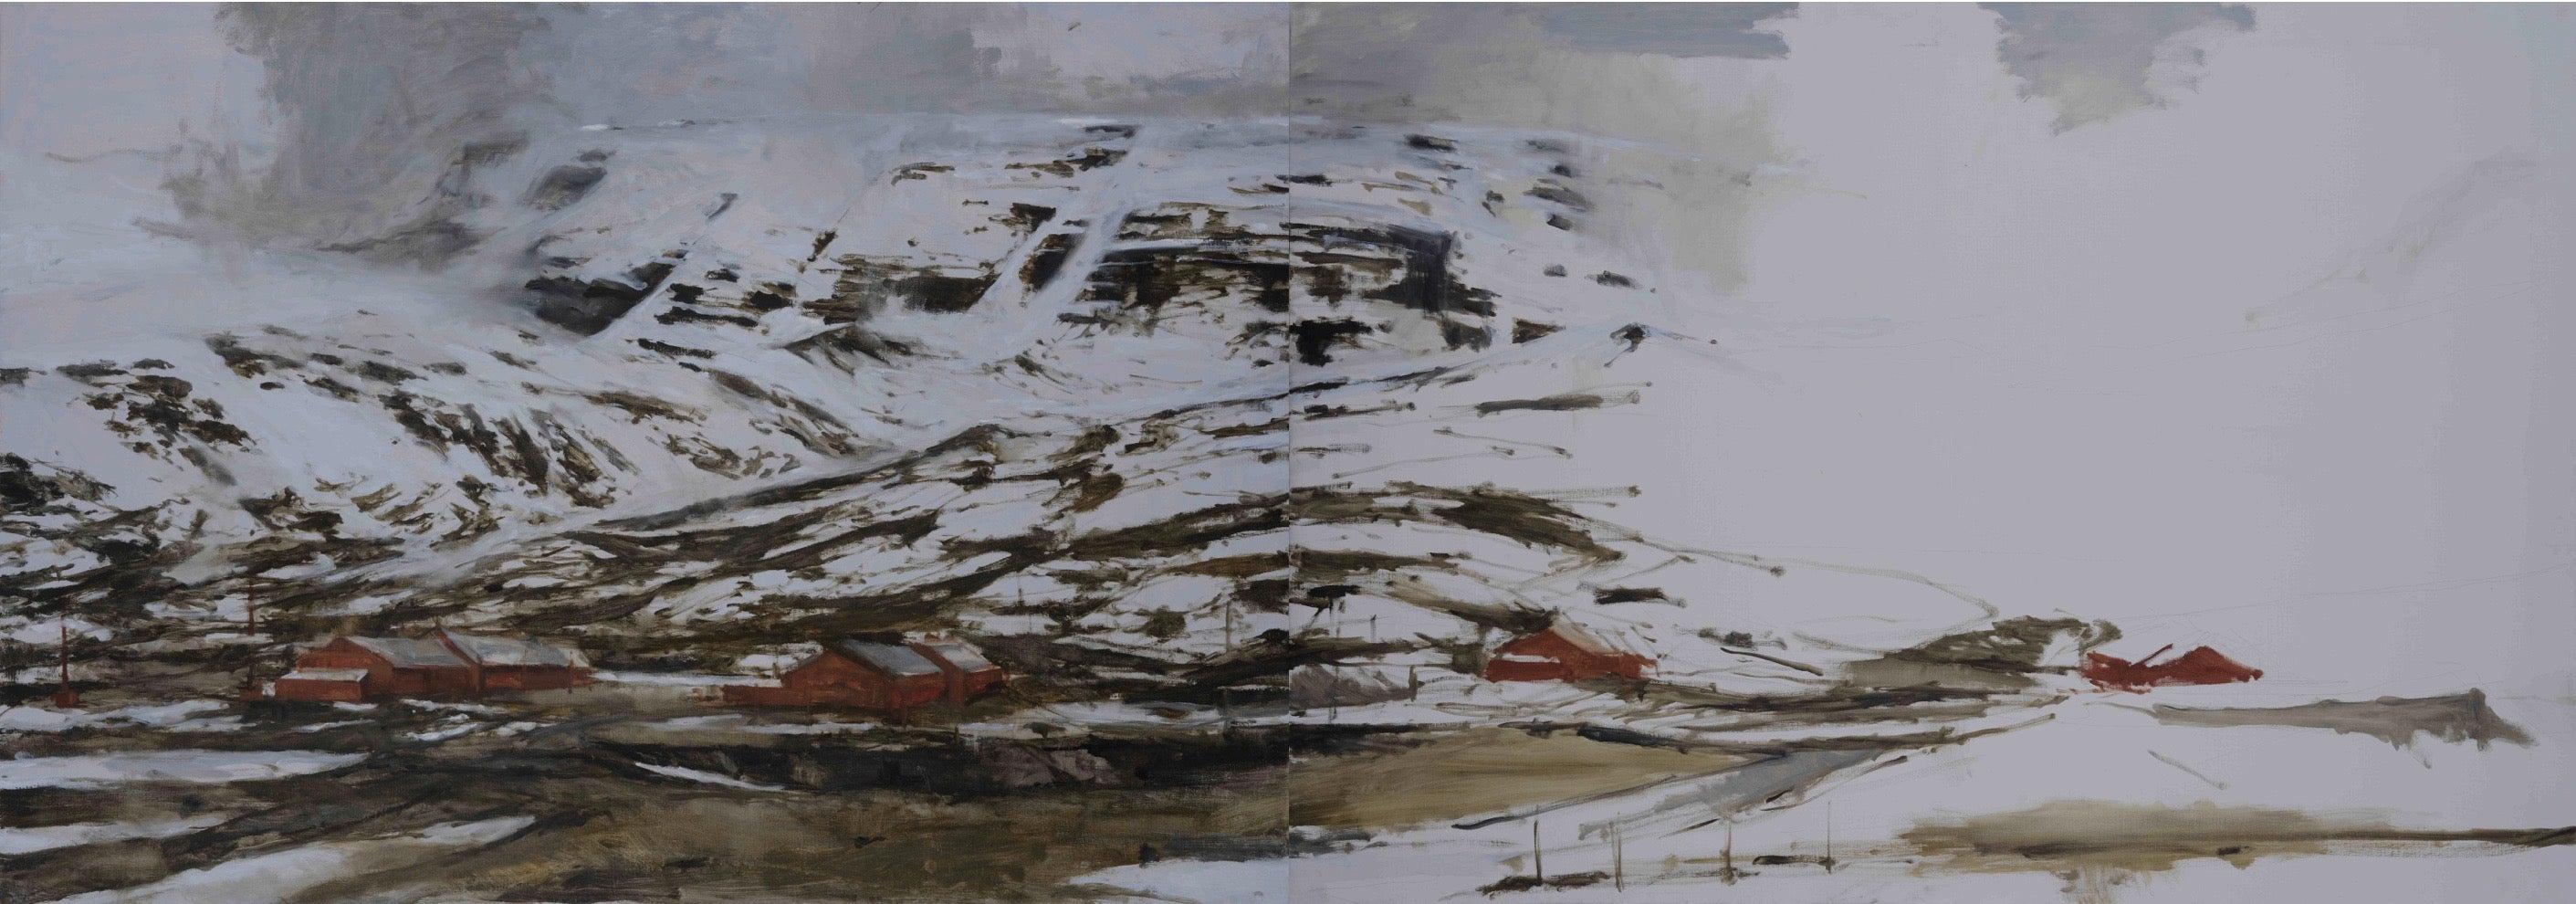 Myrdal, Norway - Large-Scale Landscape Painting